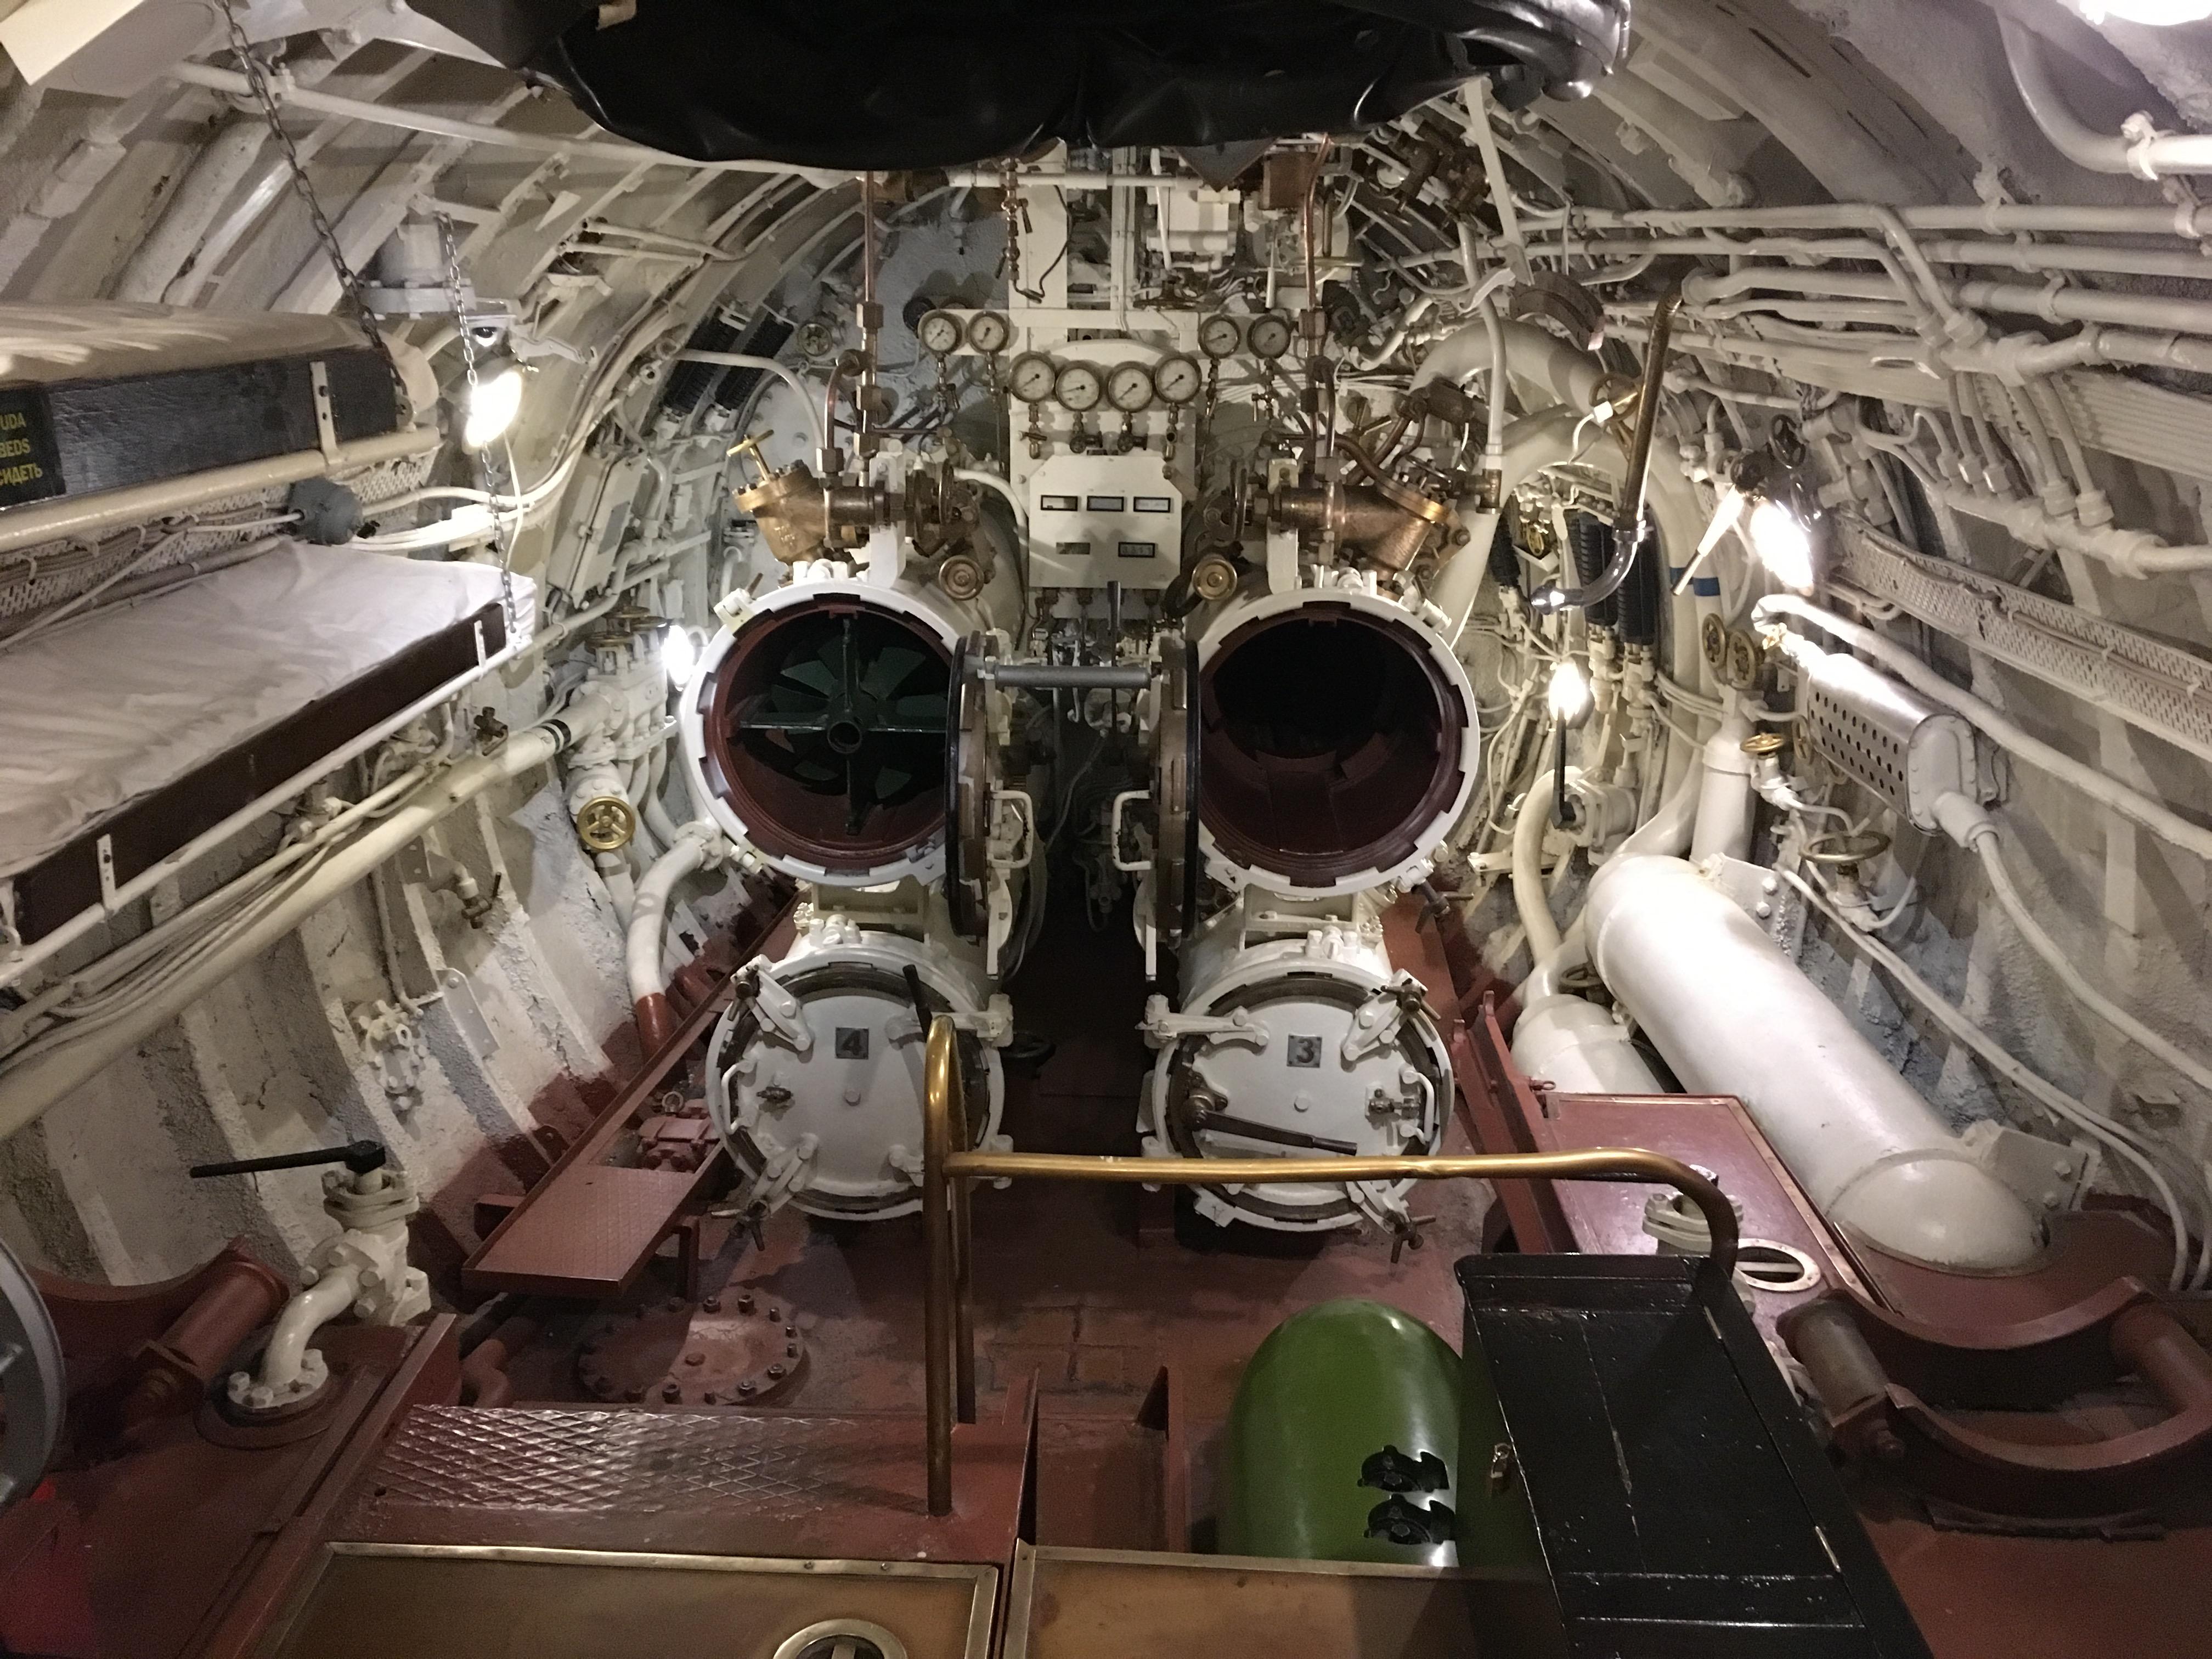 Lembit submarine, Estonian Maritime Museum in Tallinn